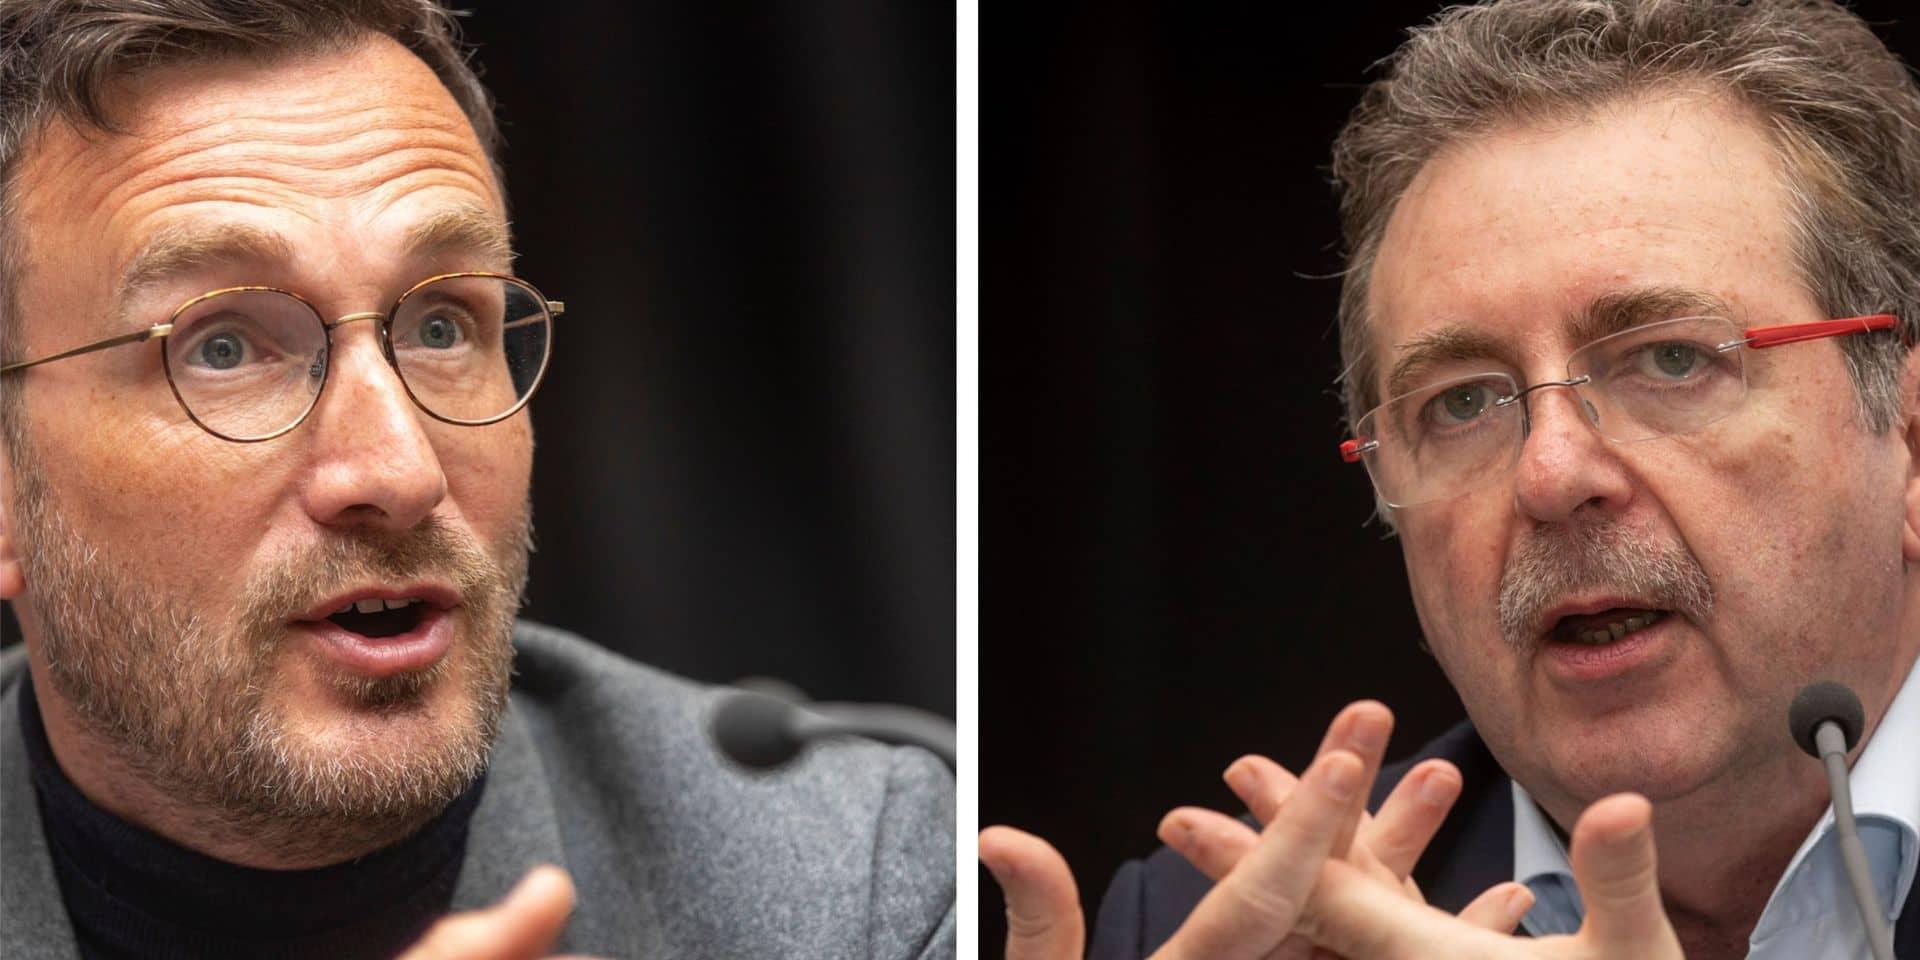 Après l'Arau, Pascal Smet et Rudi Vervoort musellent l'ASBL Inter-Environnement Bruxelles